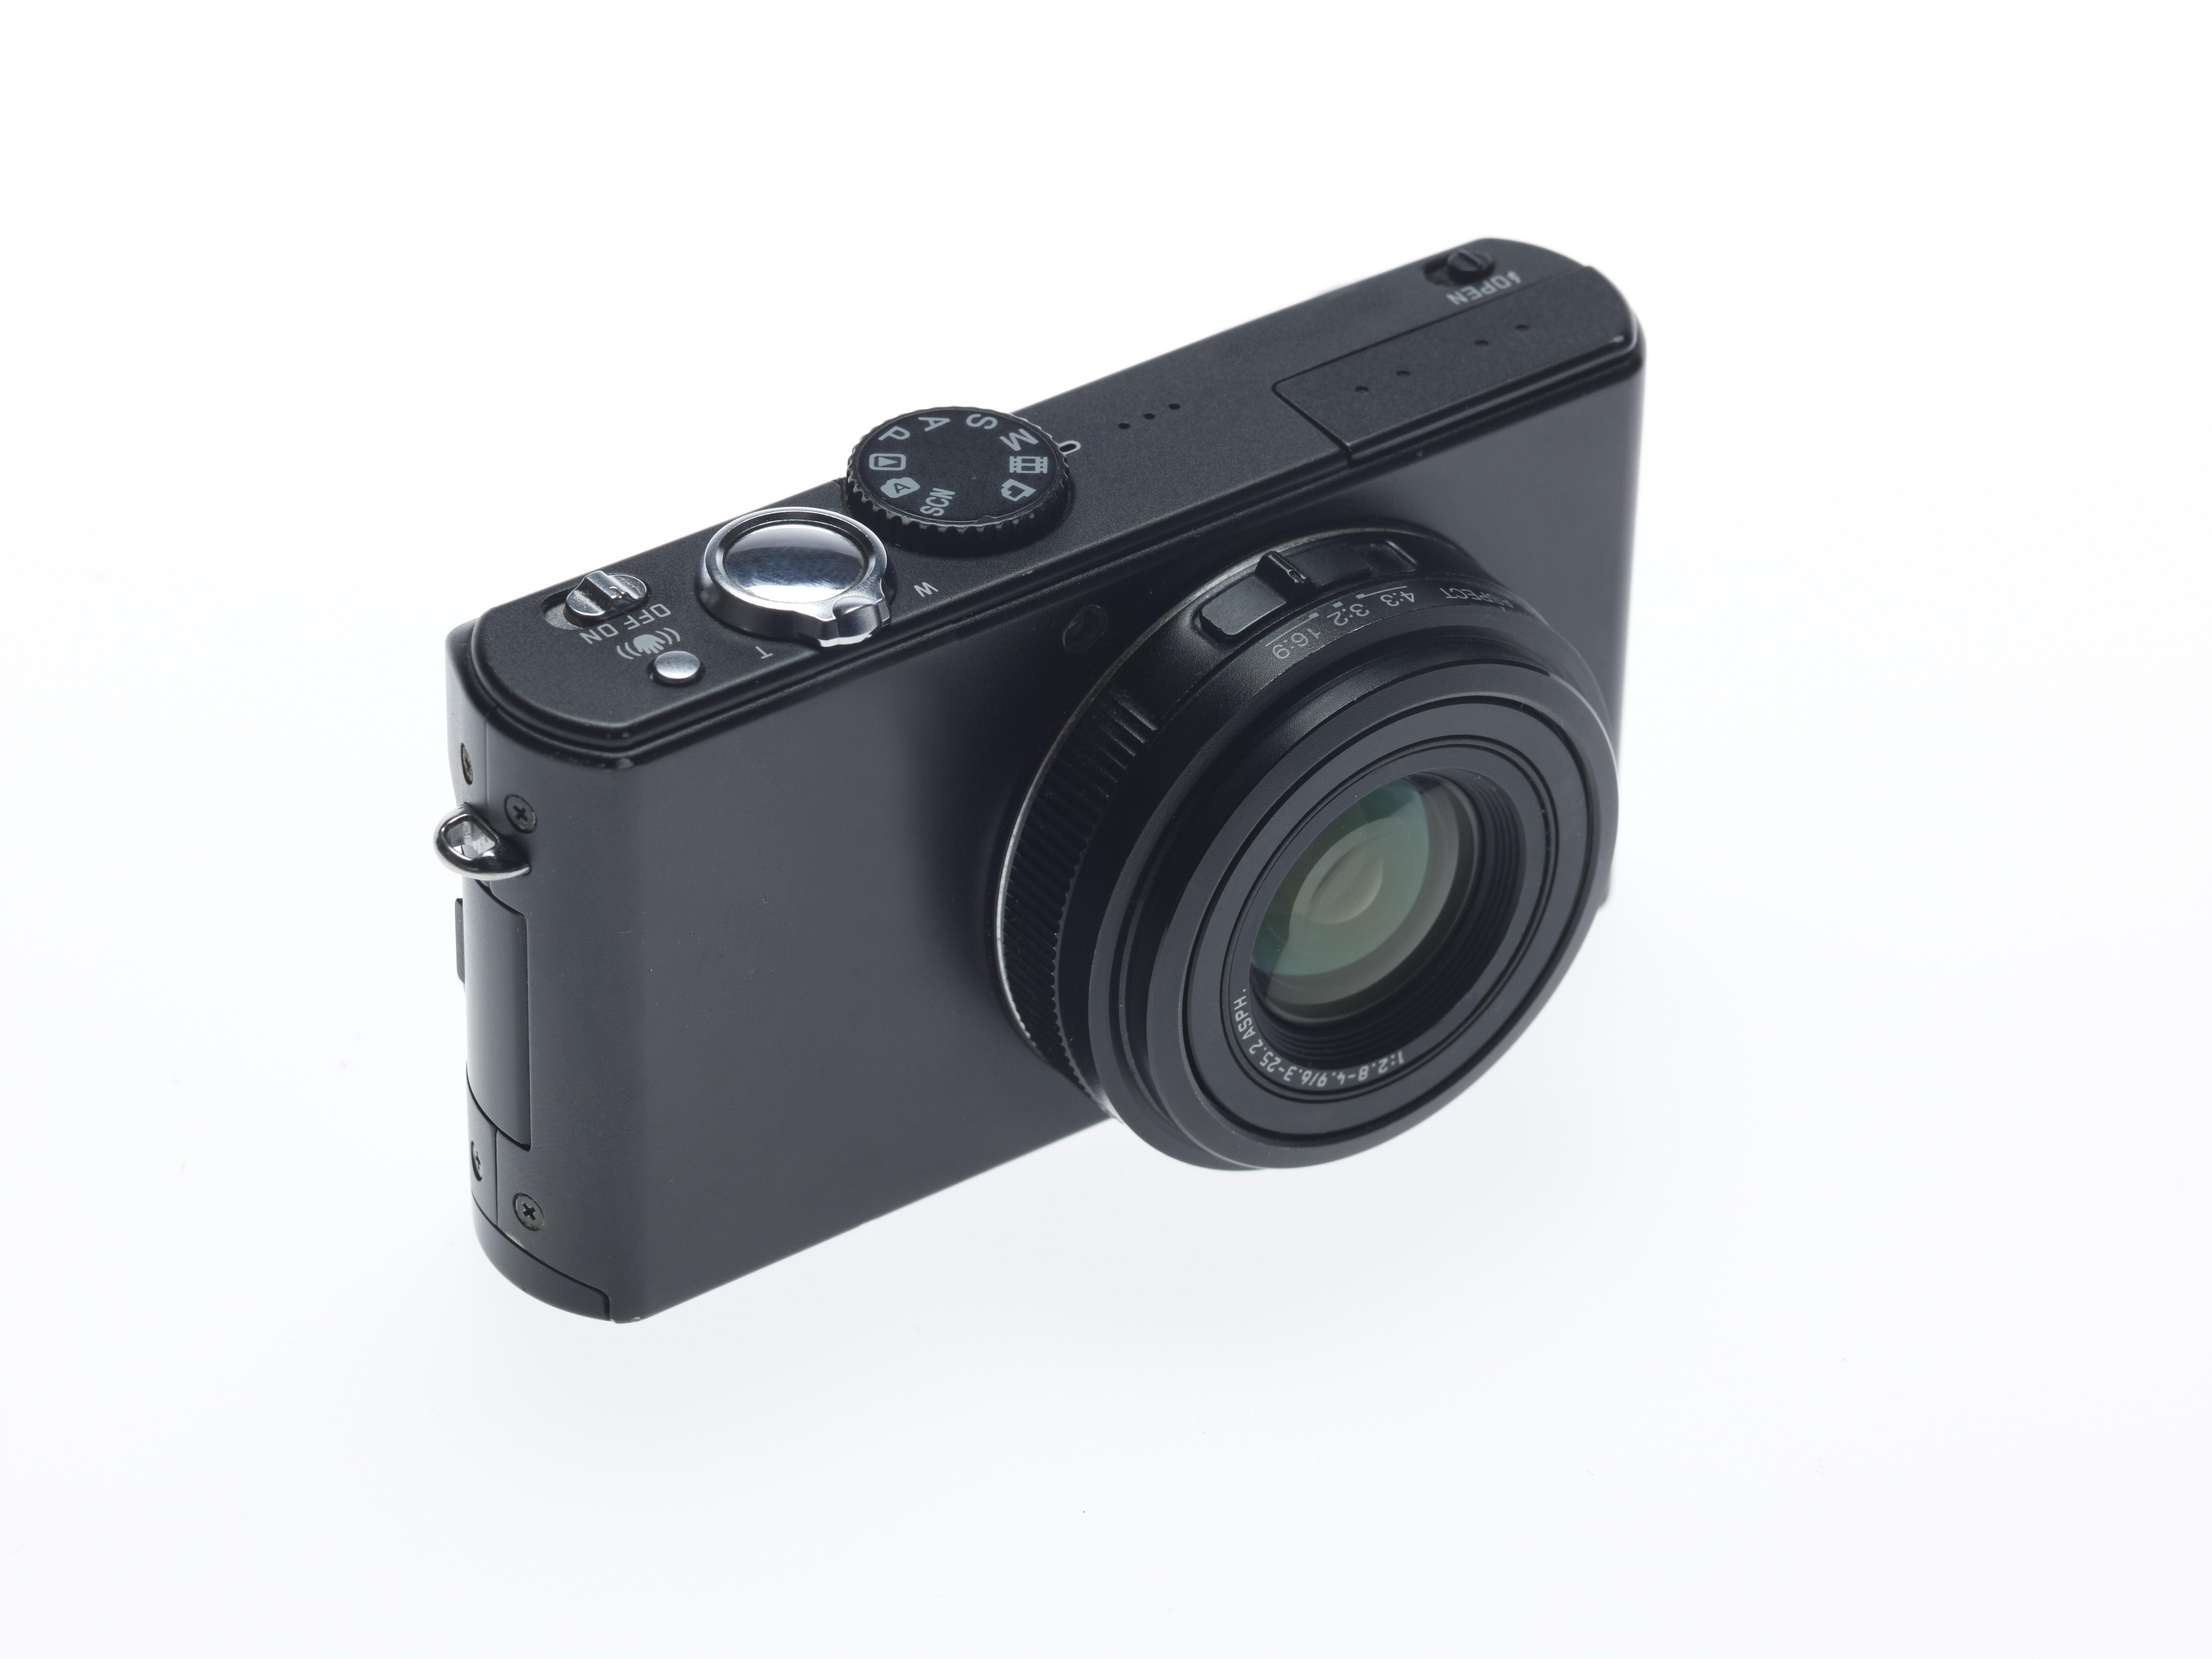 Kameratyp: Kompaktkamera